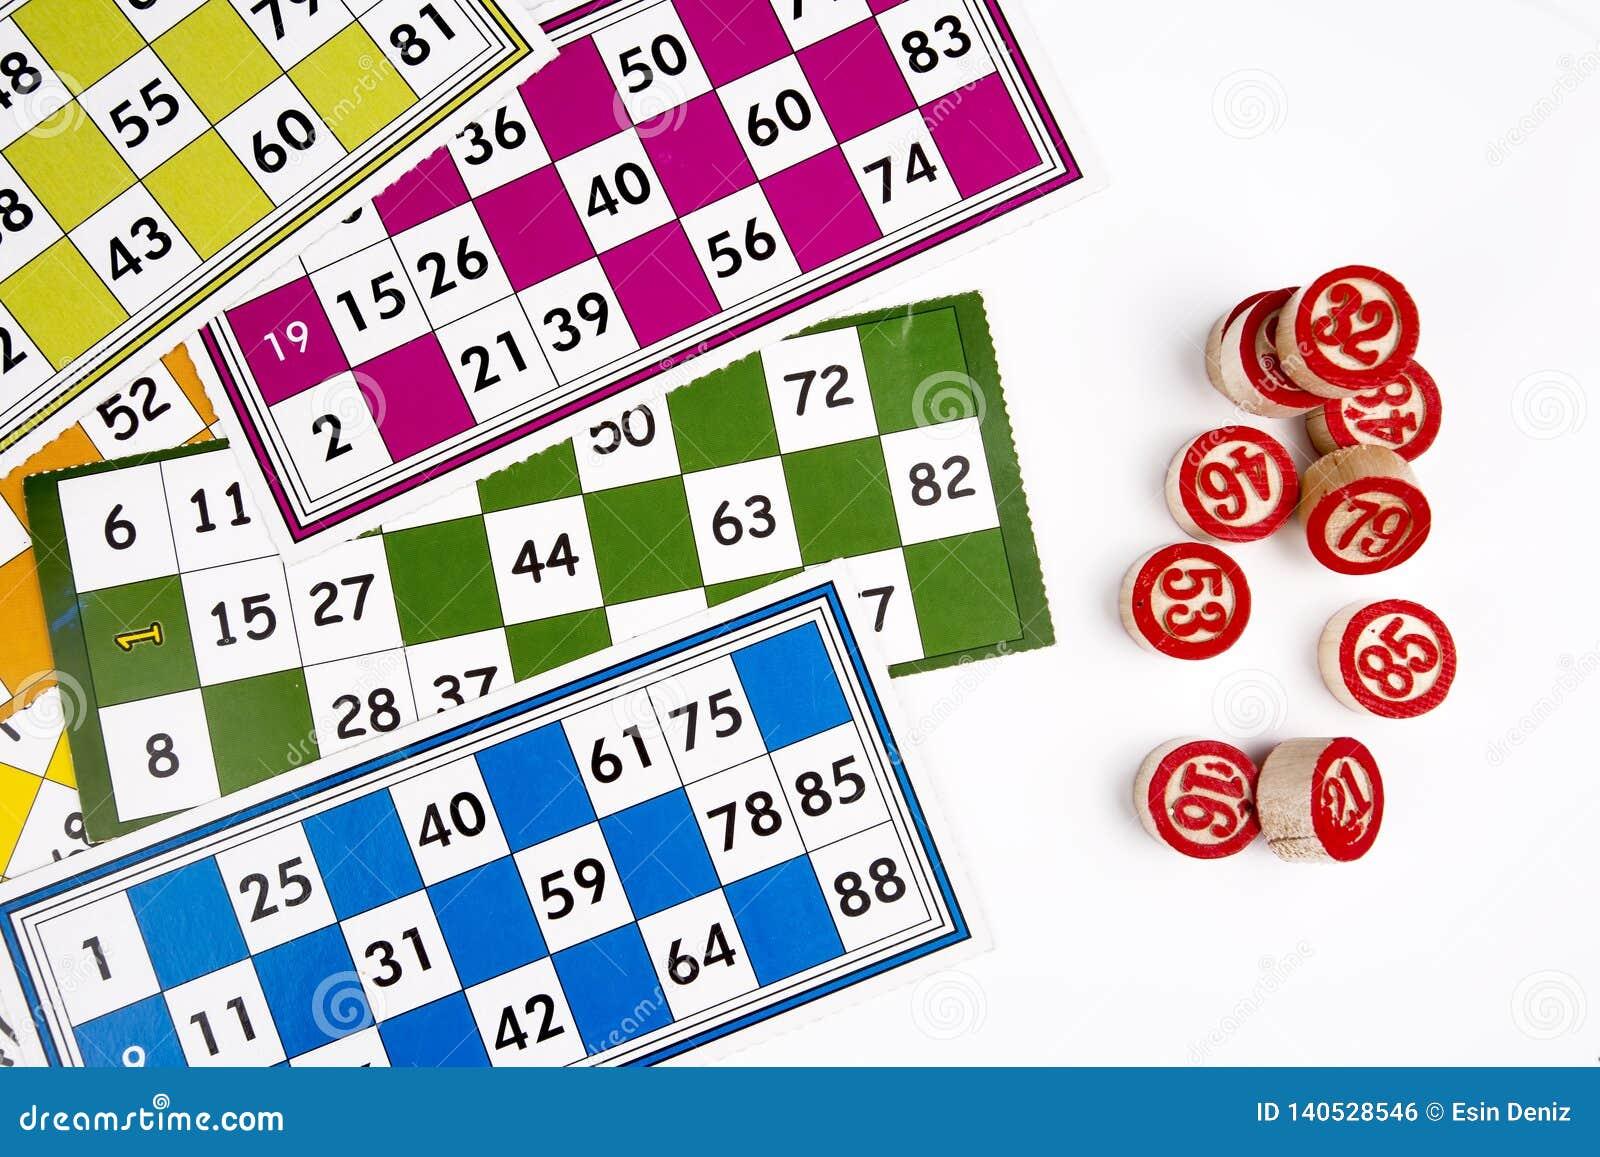 lotto 6 aus 49 jackpot gewinner